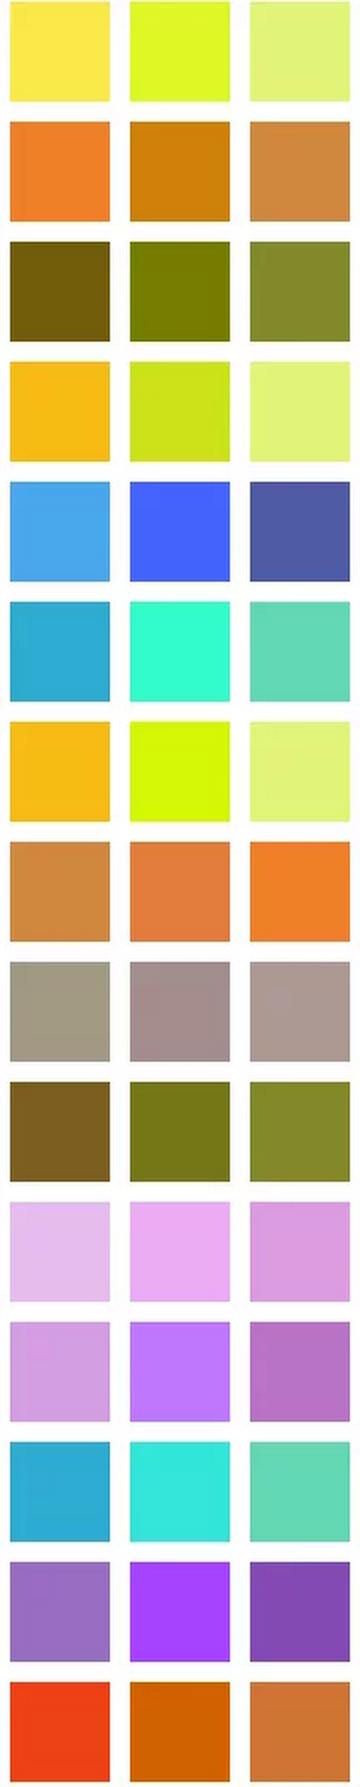 rgb vs cie lab color matching accuracy